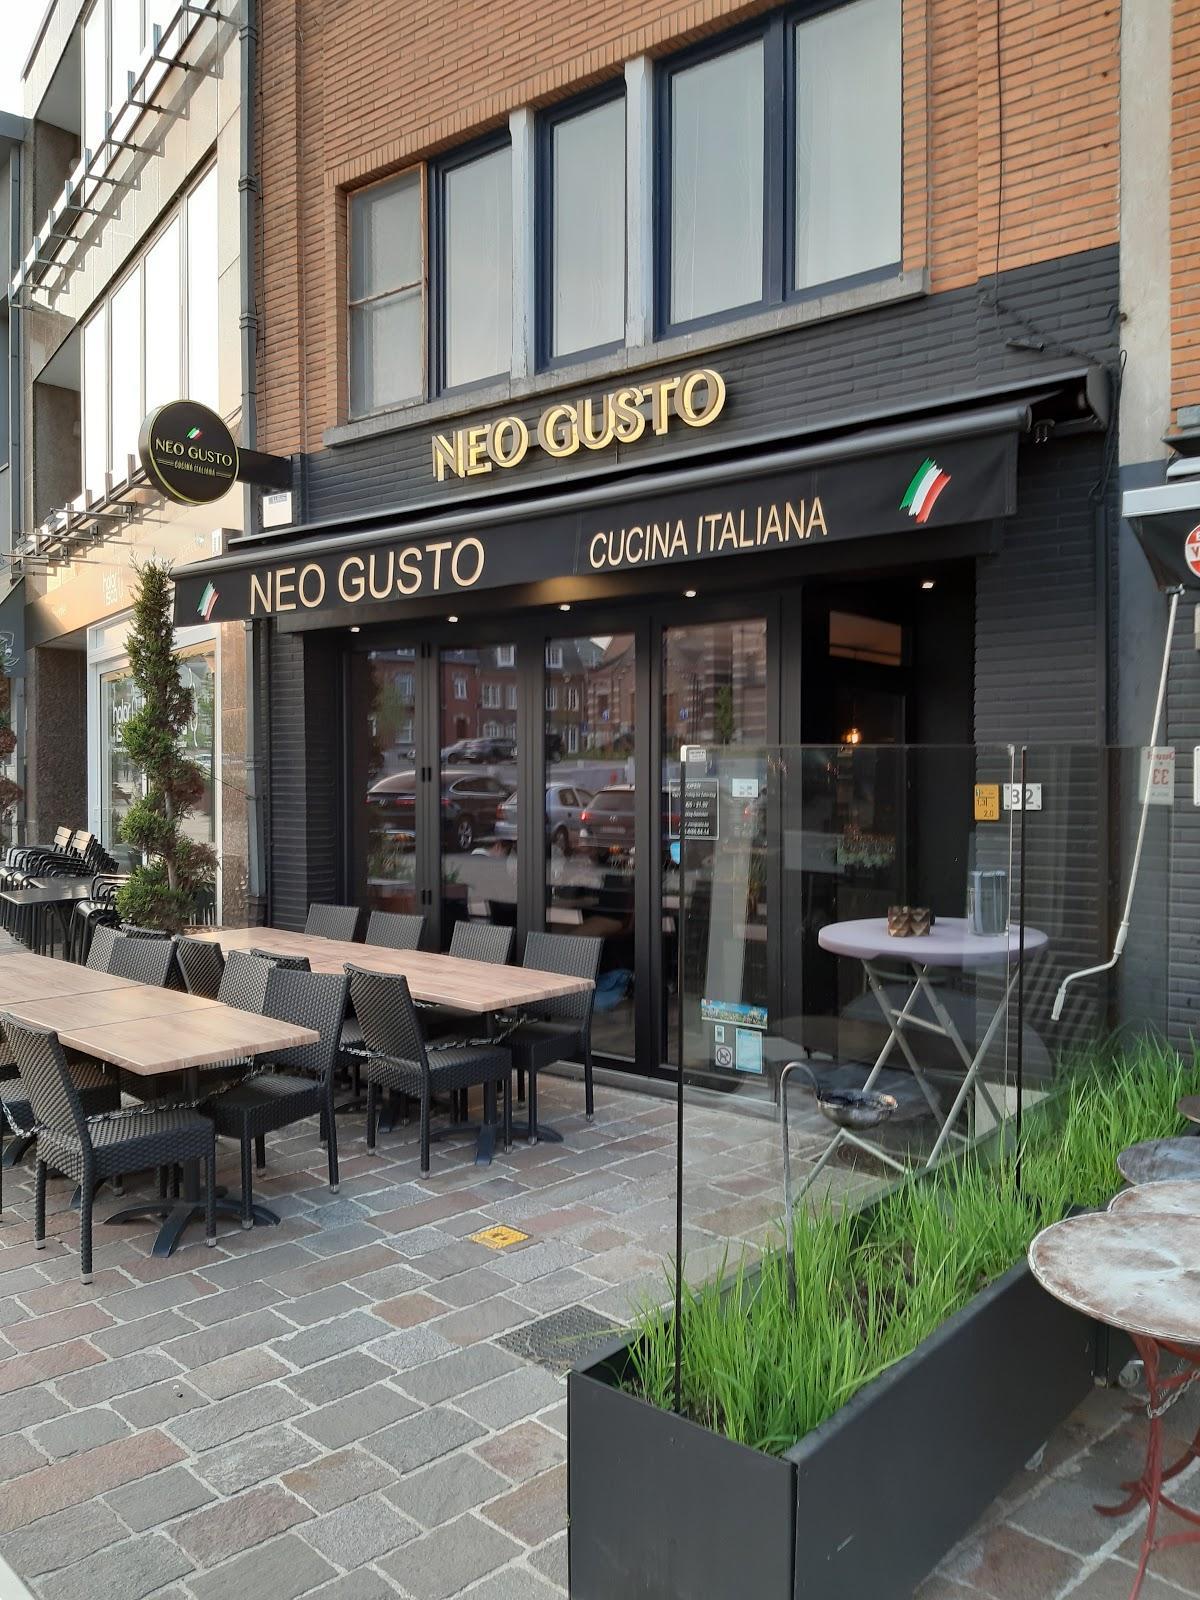 Neo Gusto photo